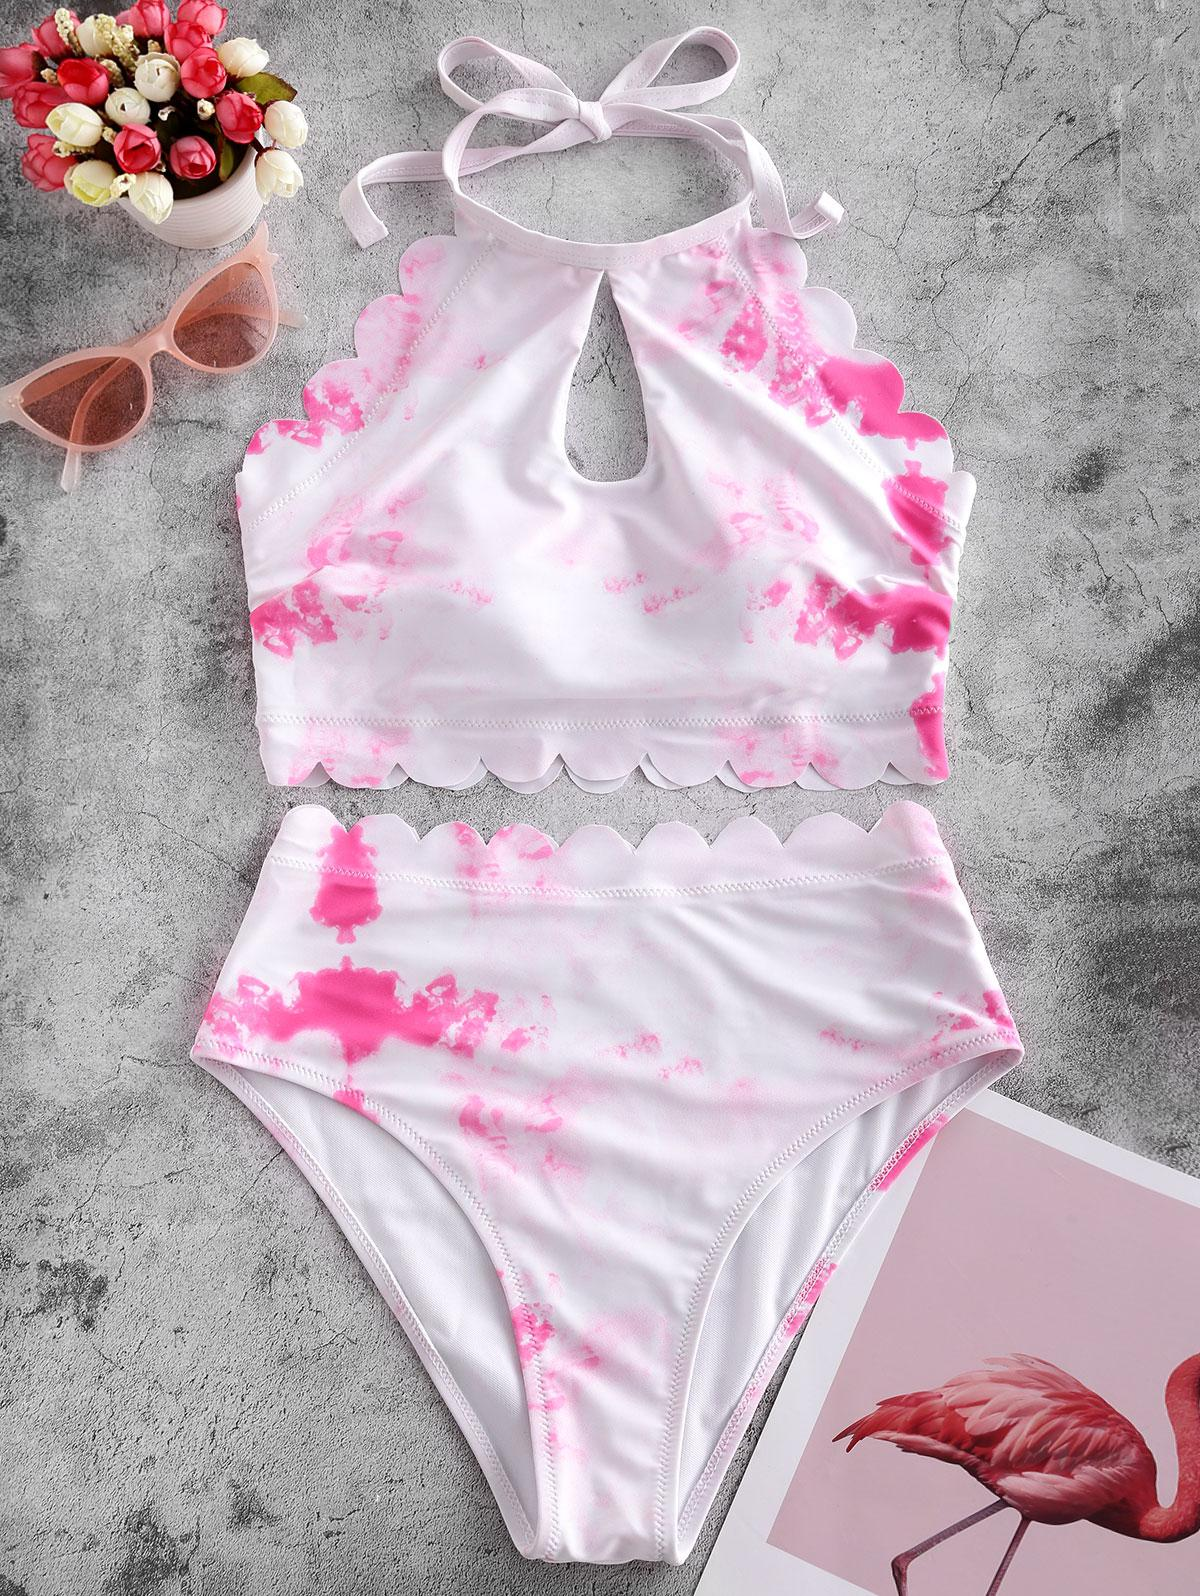 ZAFUL Scalloped High Waisted Tie Dye Tankini Swimsuit, Neon pink